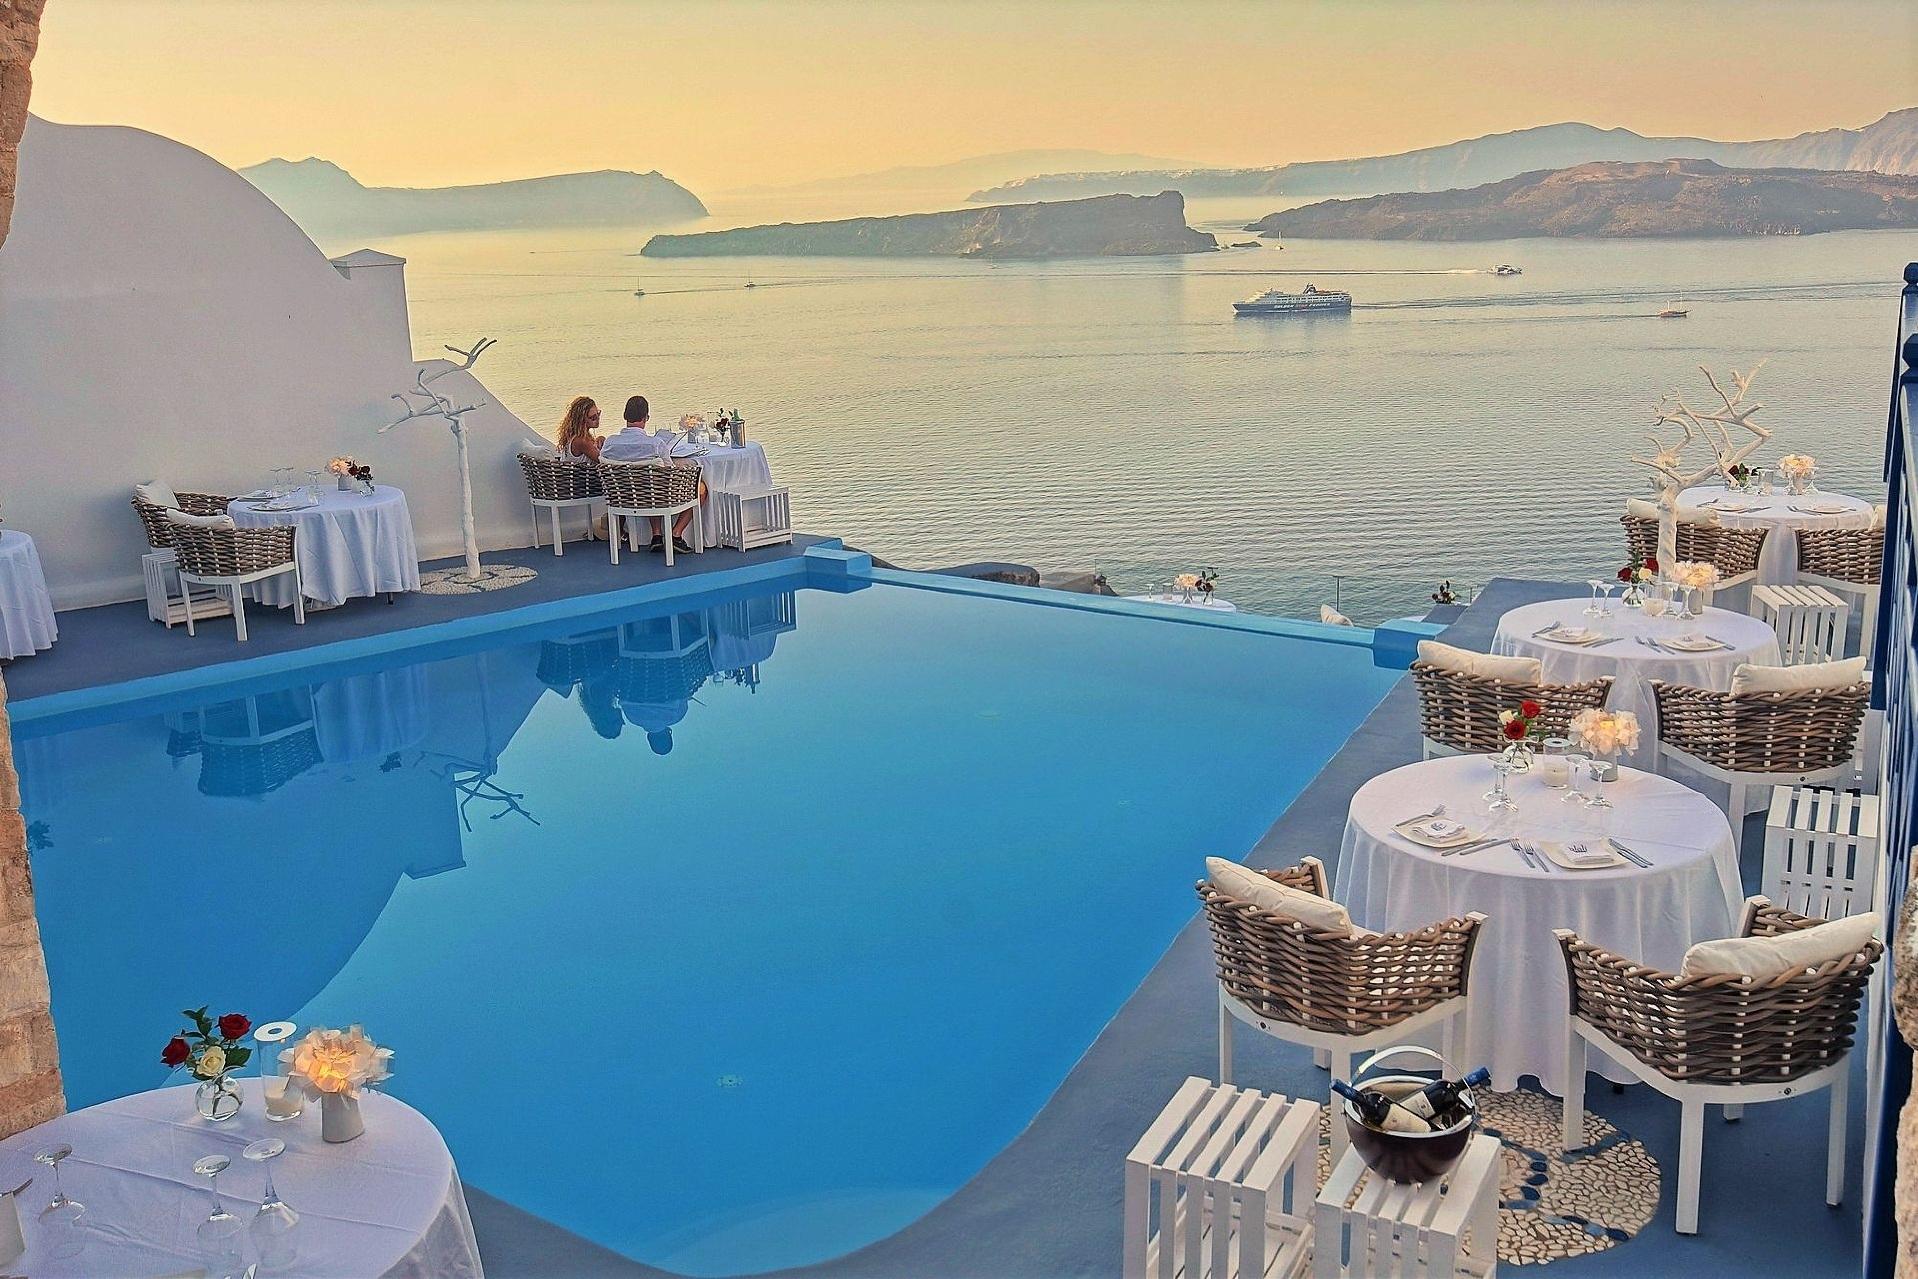 Alali_Restaurant_in_Astarte_Suites_Hotel_-_Fine_dining_Santorini.jpg